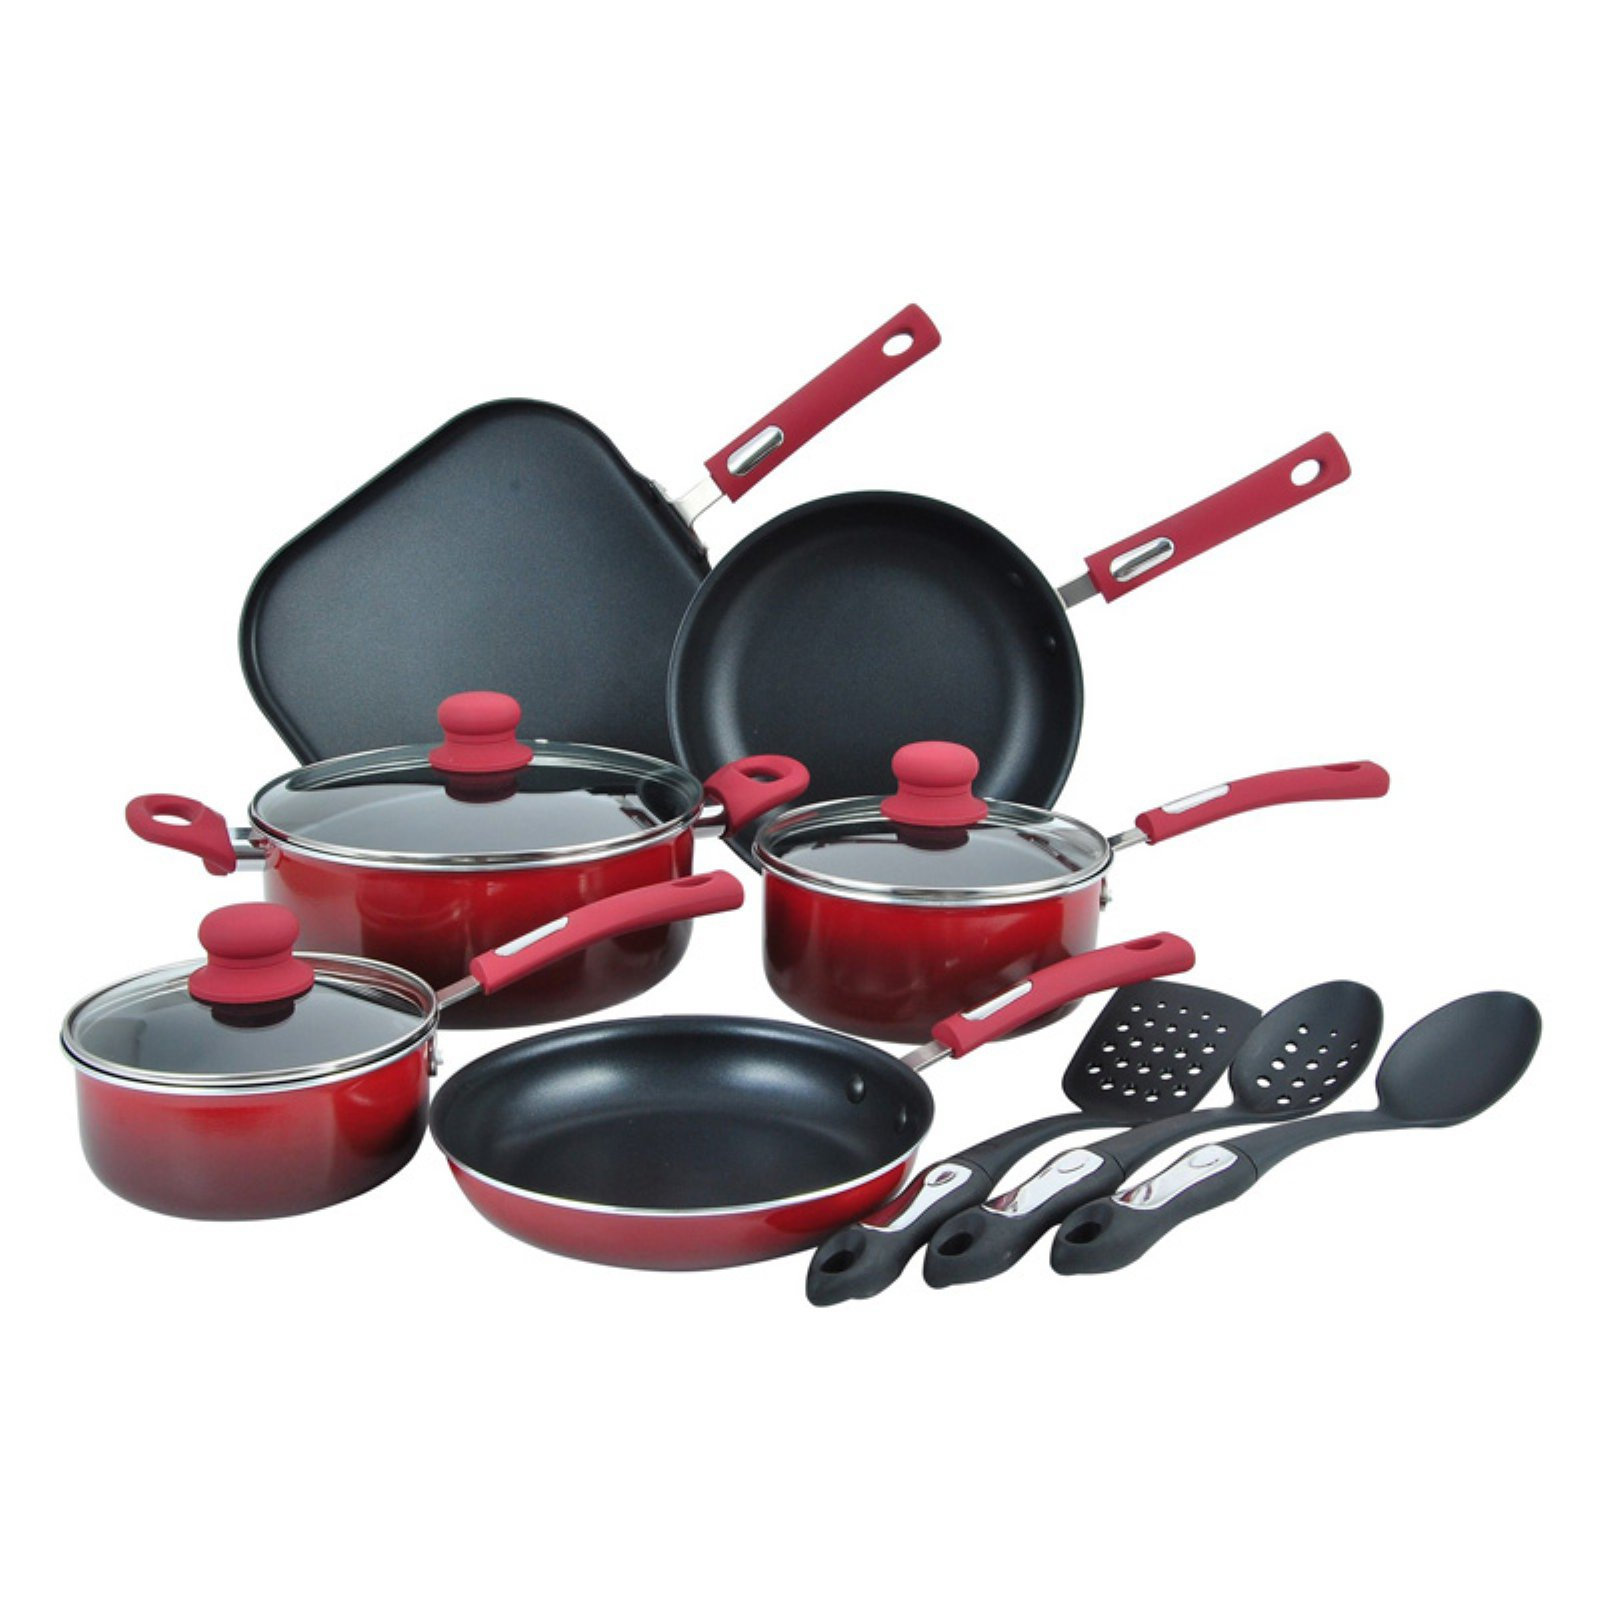 Hamilton Beach 12pc Aluminum Cookware Set, 3.0mm, Gradient Red, Non-Stick Interior, Soft Touch Handles